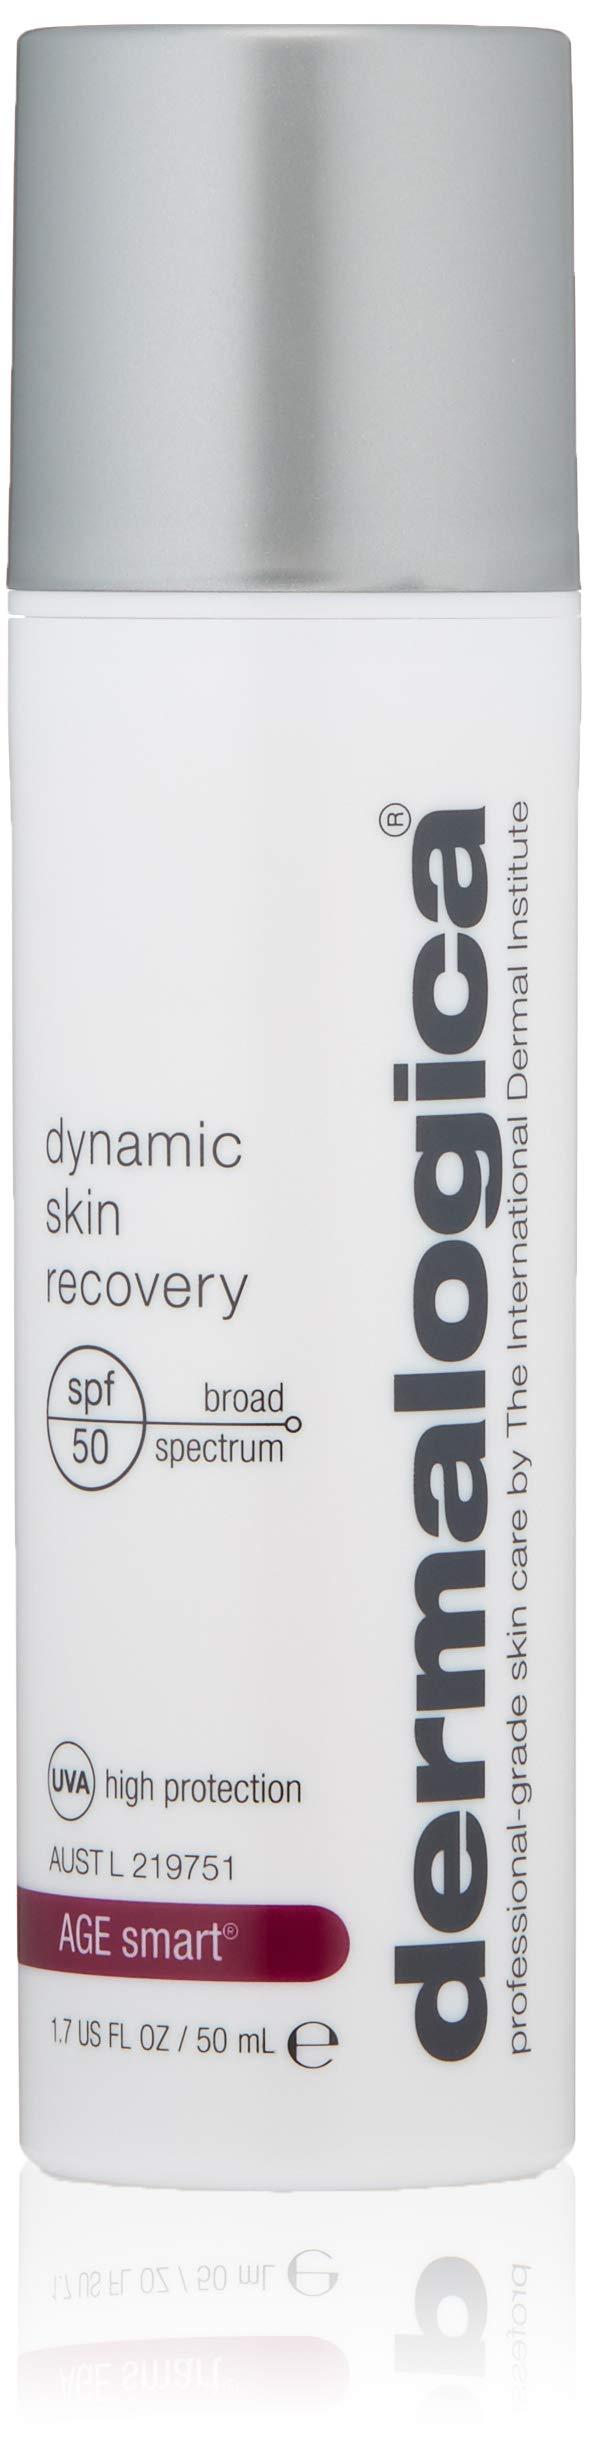 Dermalogica Dynamic Skin Recovery SPF 50 Broad Spectrum, 1.7 Fl Oz by DERMALOGICA